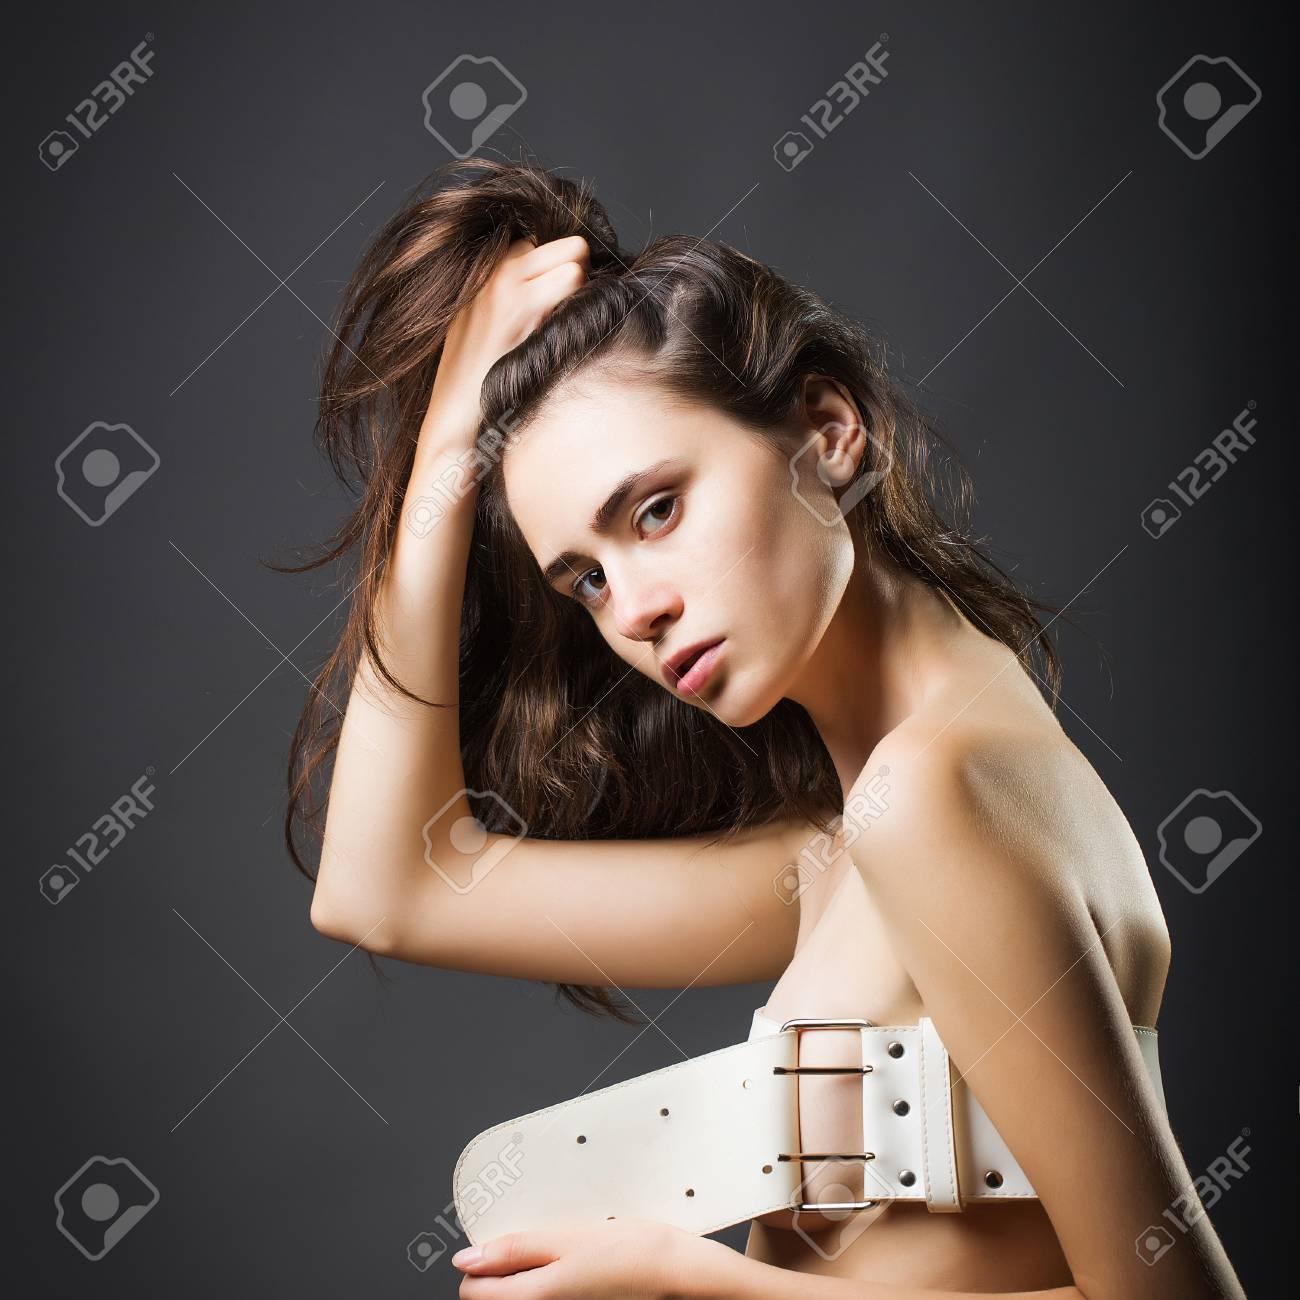 Paula abdul sexy images